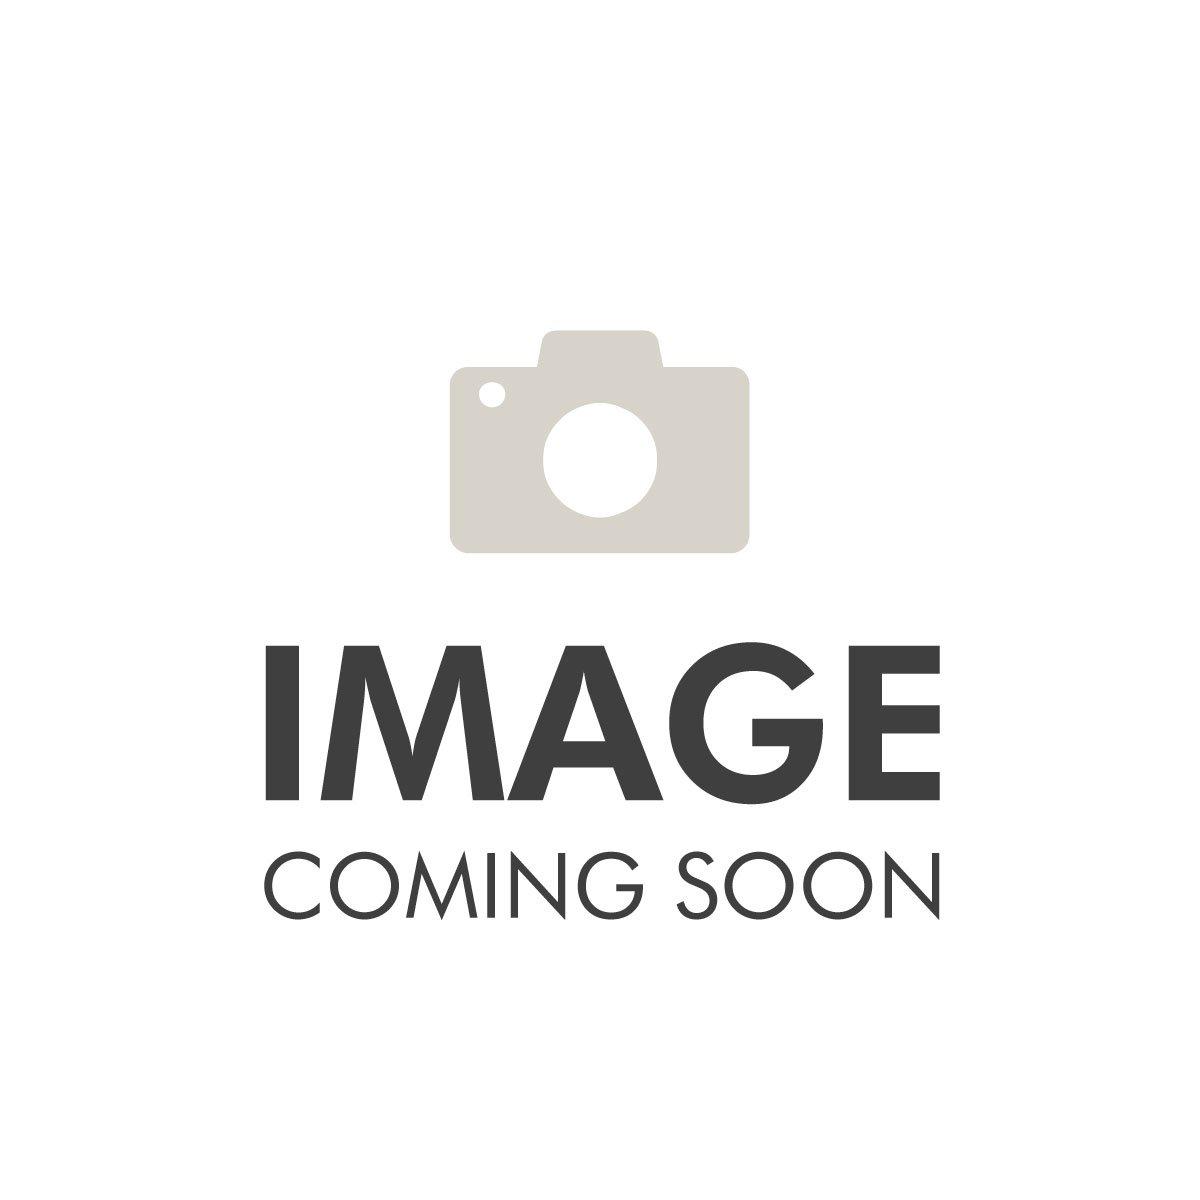 the best attitude b5475 9fdf1 Adidas Fragrances Adidas Fruity Rhythm 50ml EDT Spray - Adidas Fragrances  from Direct Beautique UK